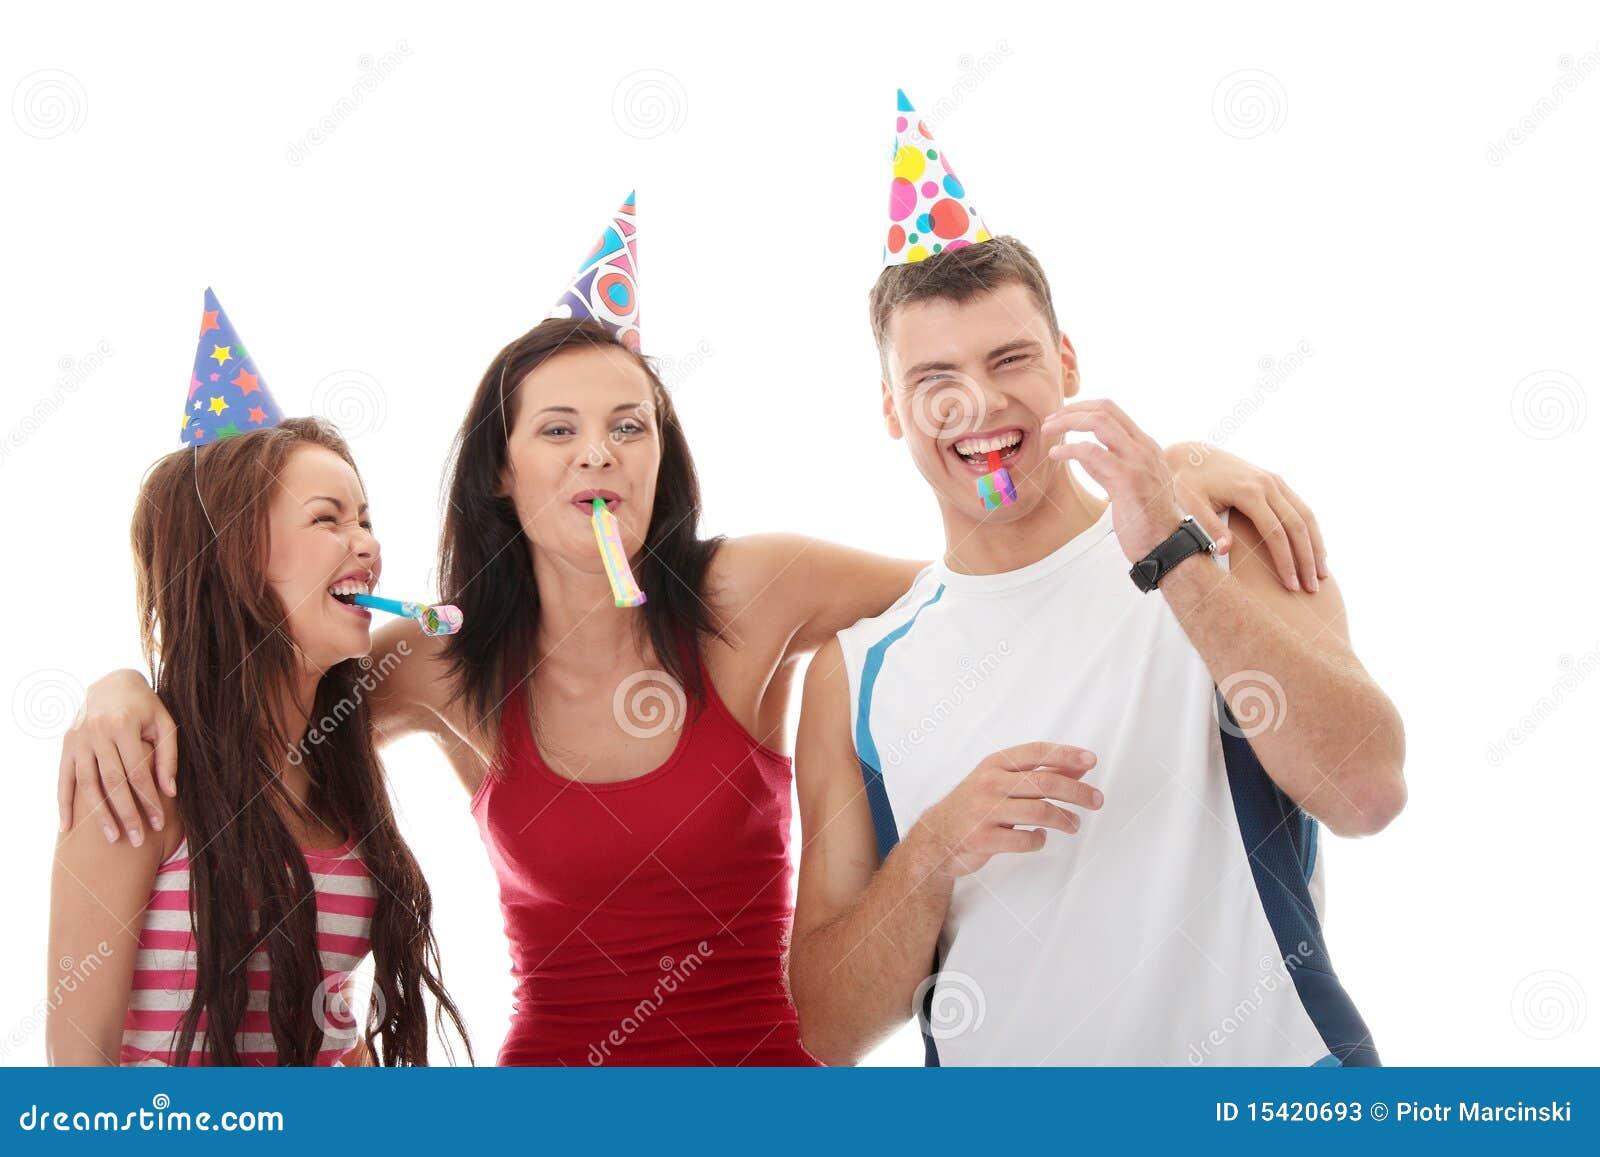 happy three friends